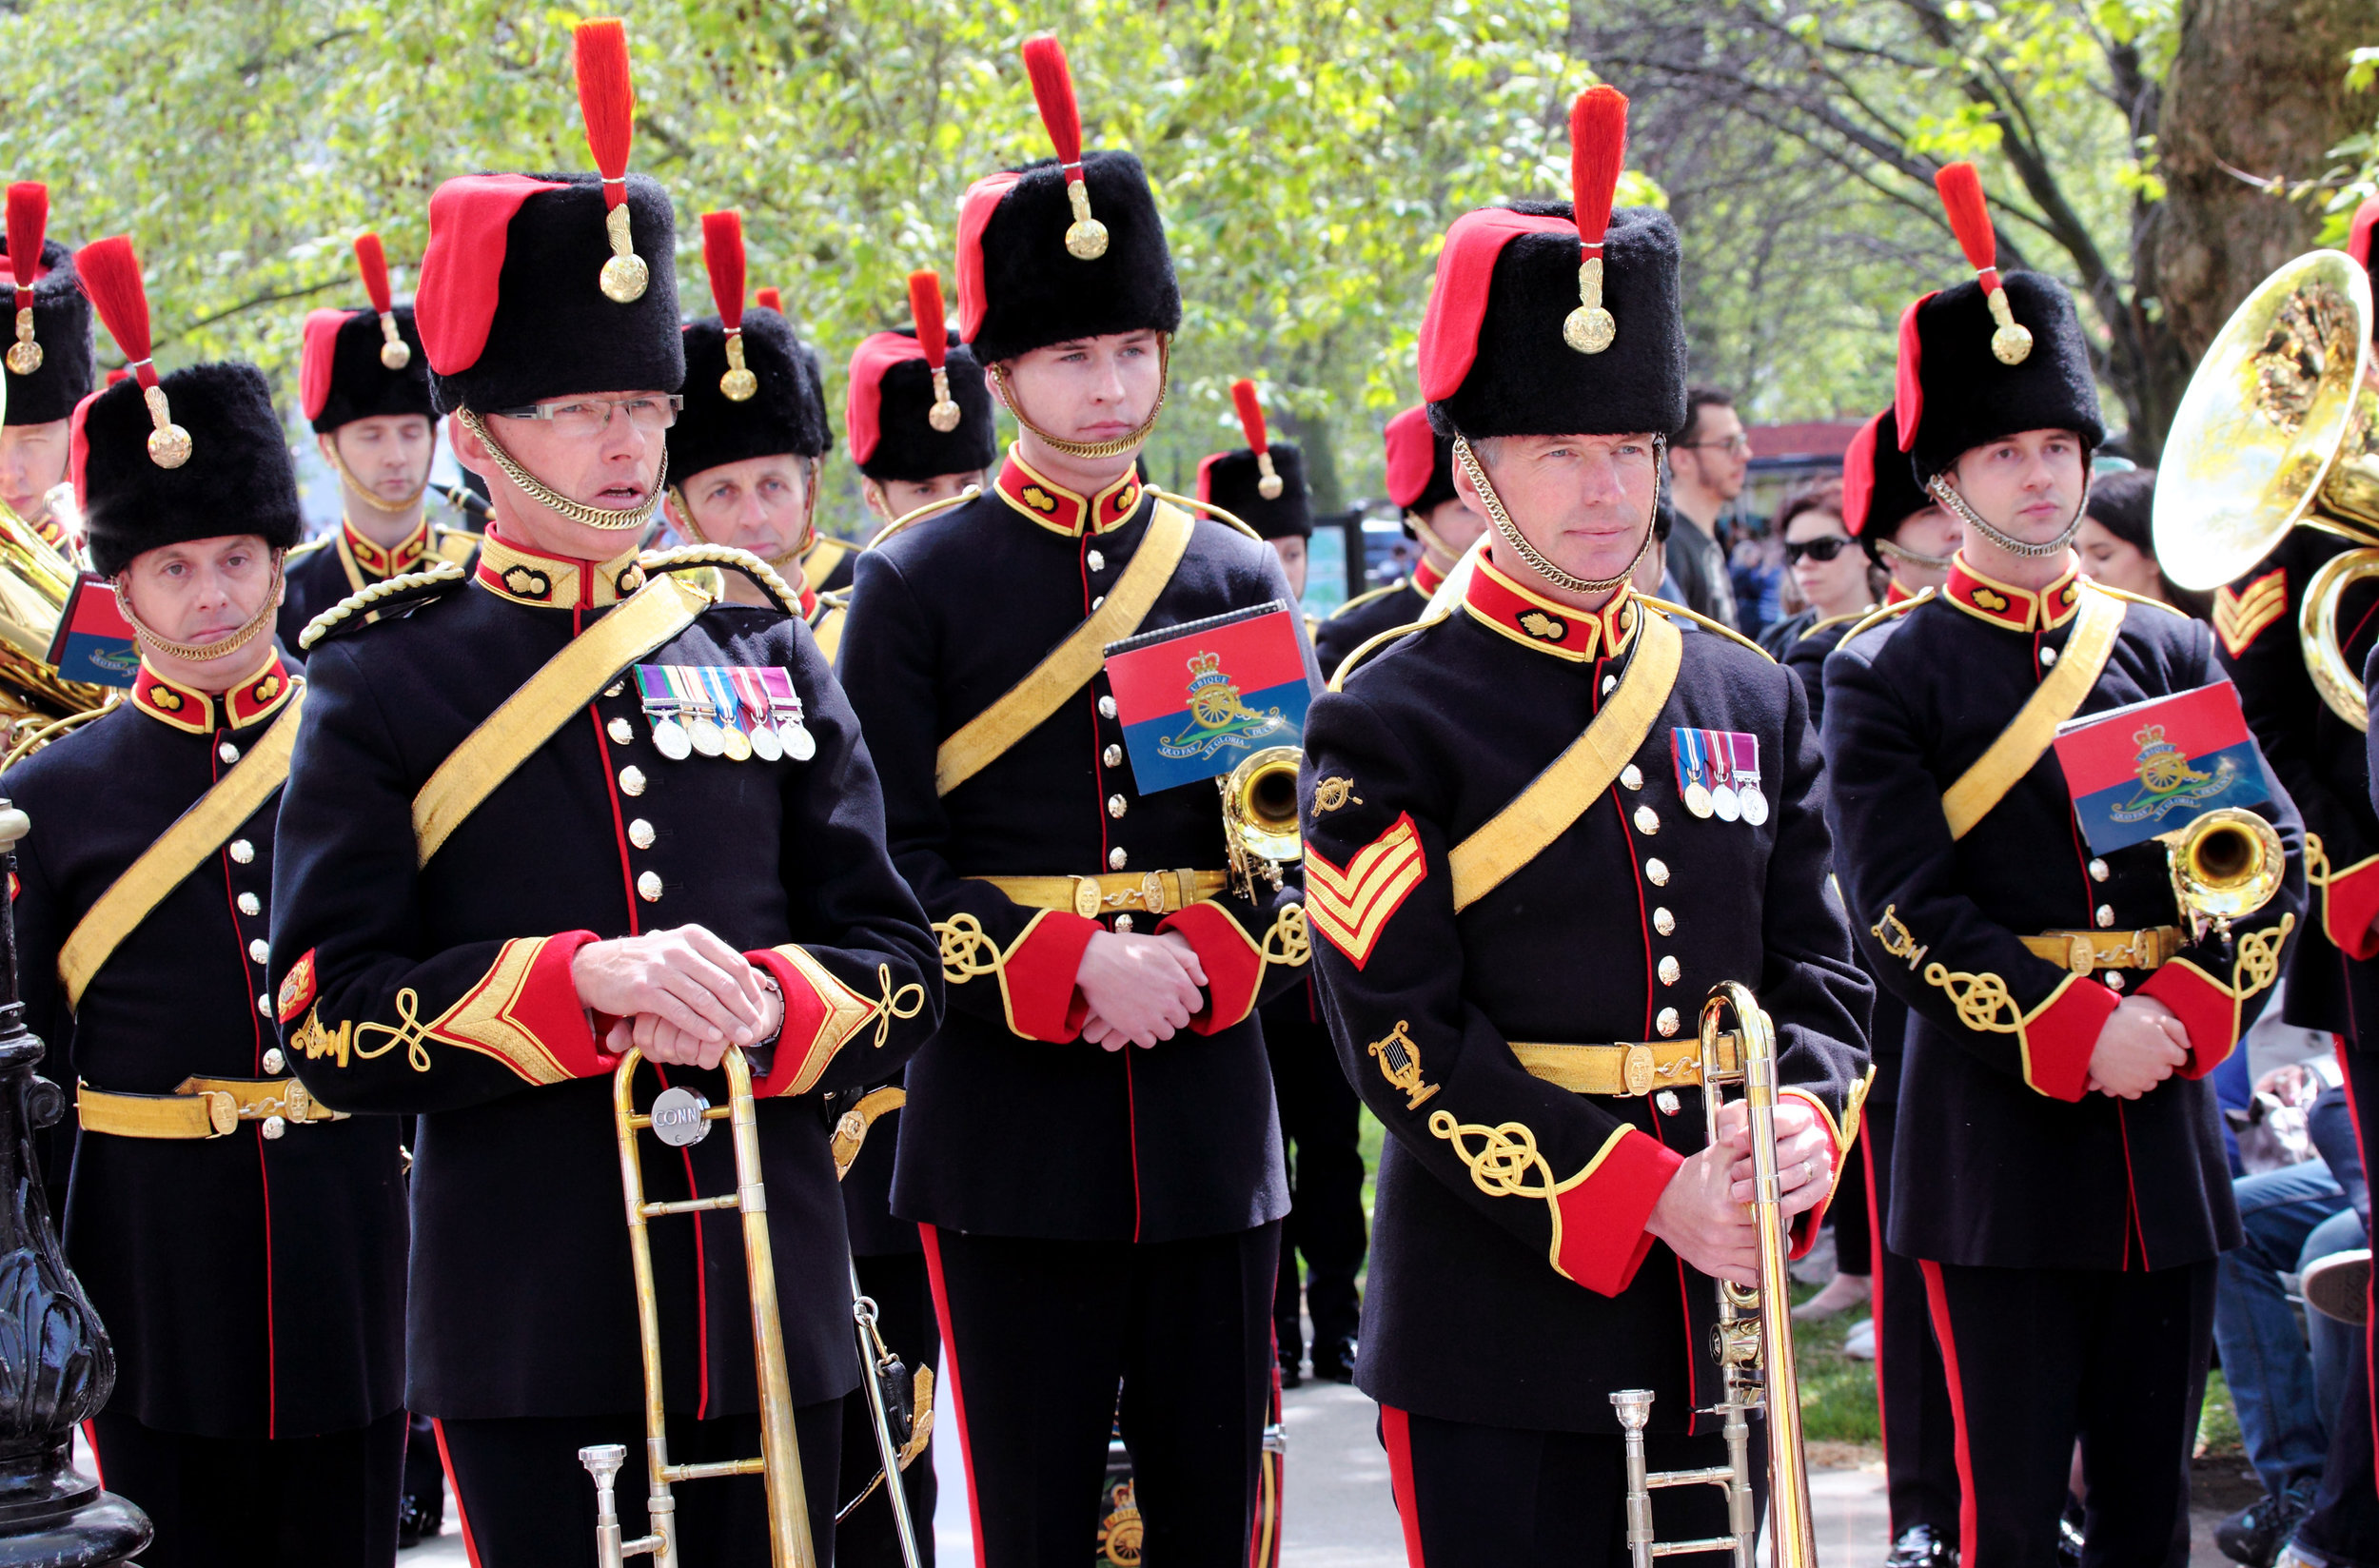 The_Royal_Artillery_Band_(17351260076).jpg